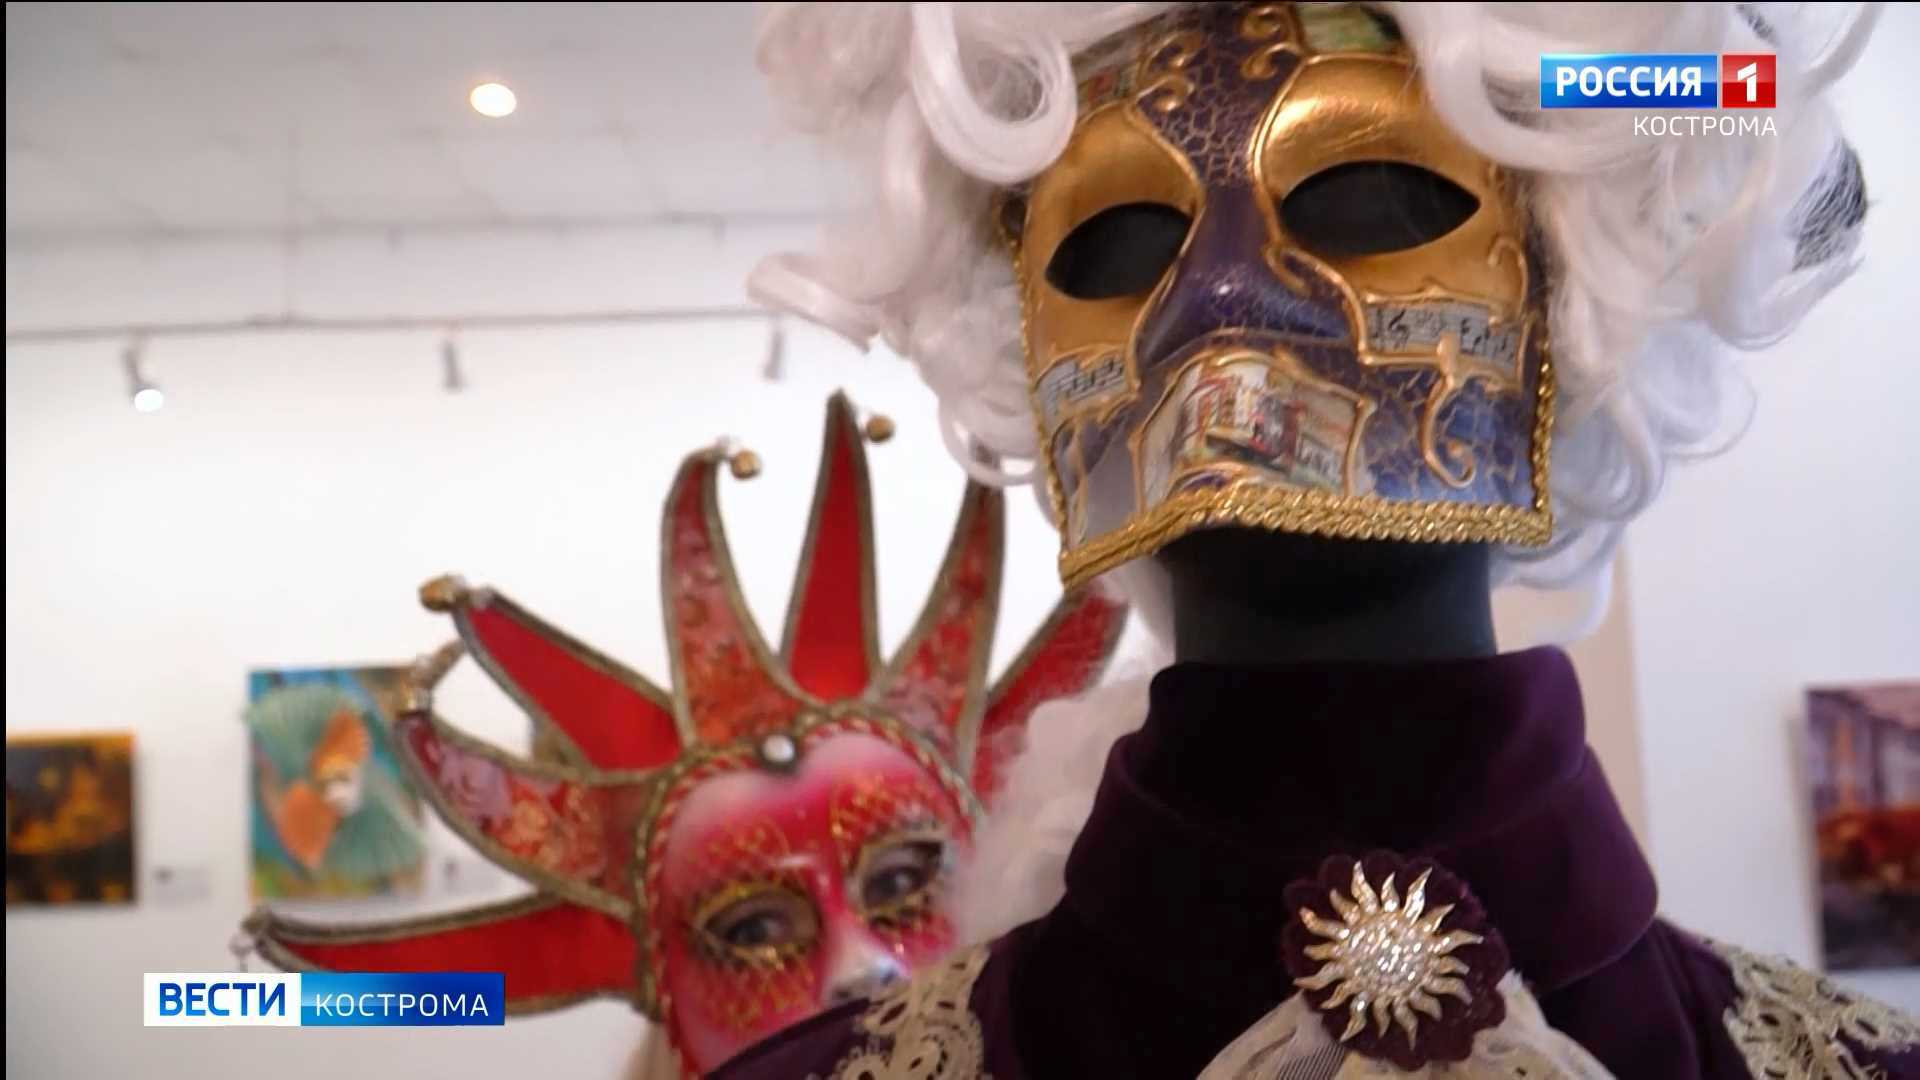 Шут, кот и чумной доктор: в Кострому привезли яркие венецианские маски